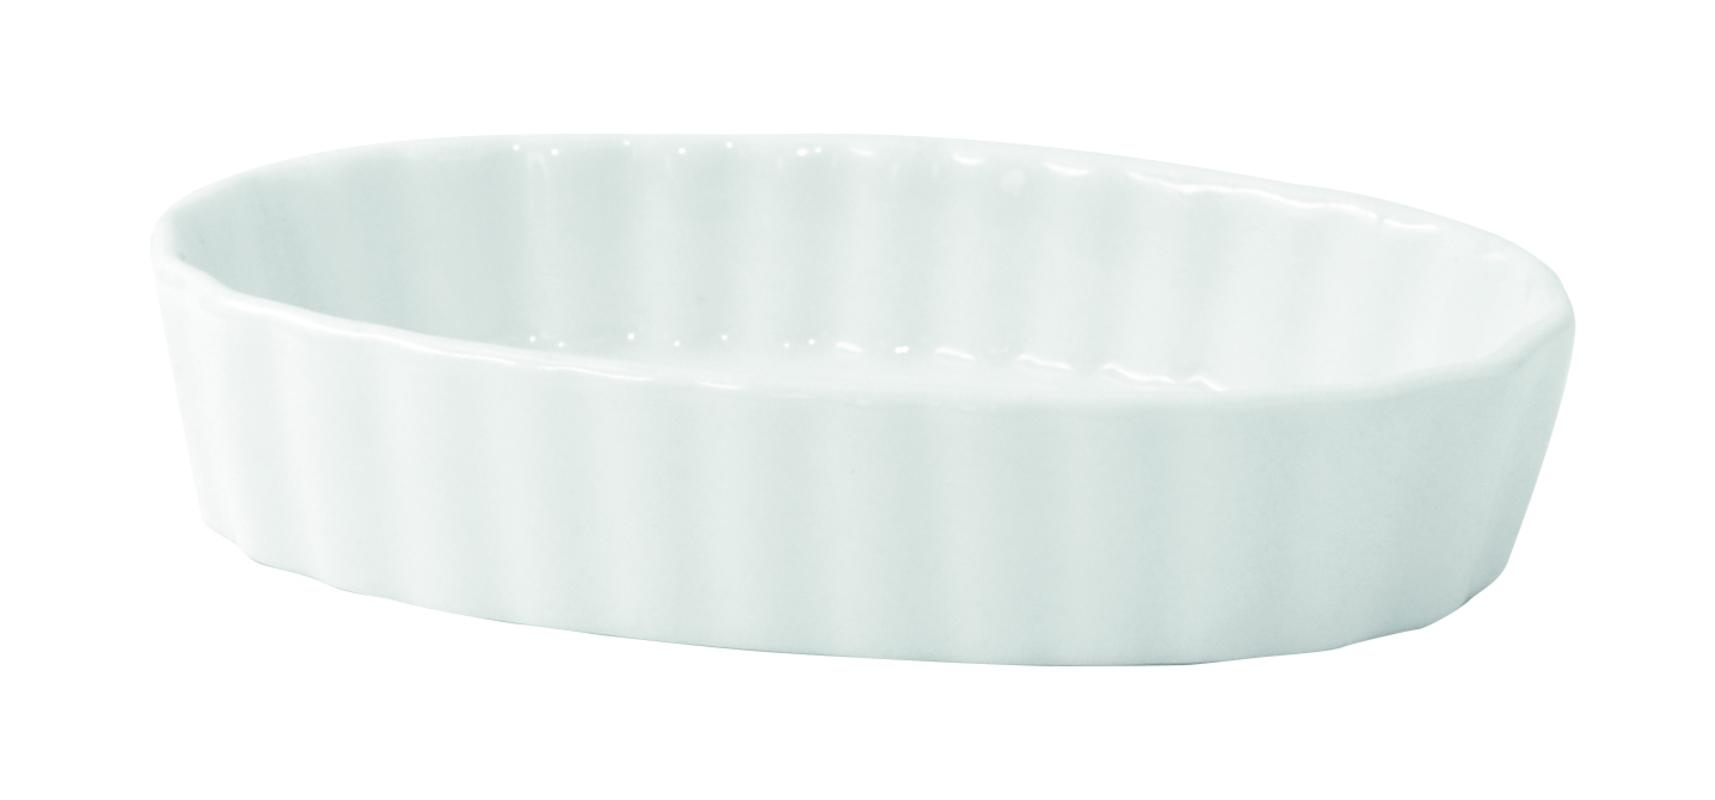 Mini White Porcelain Oval Dish - 2 oz